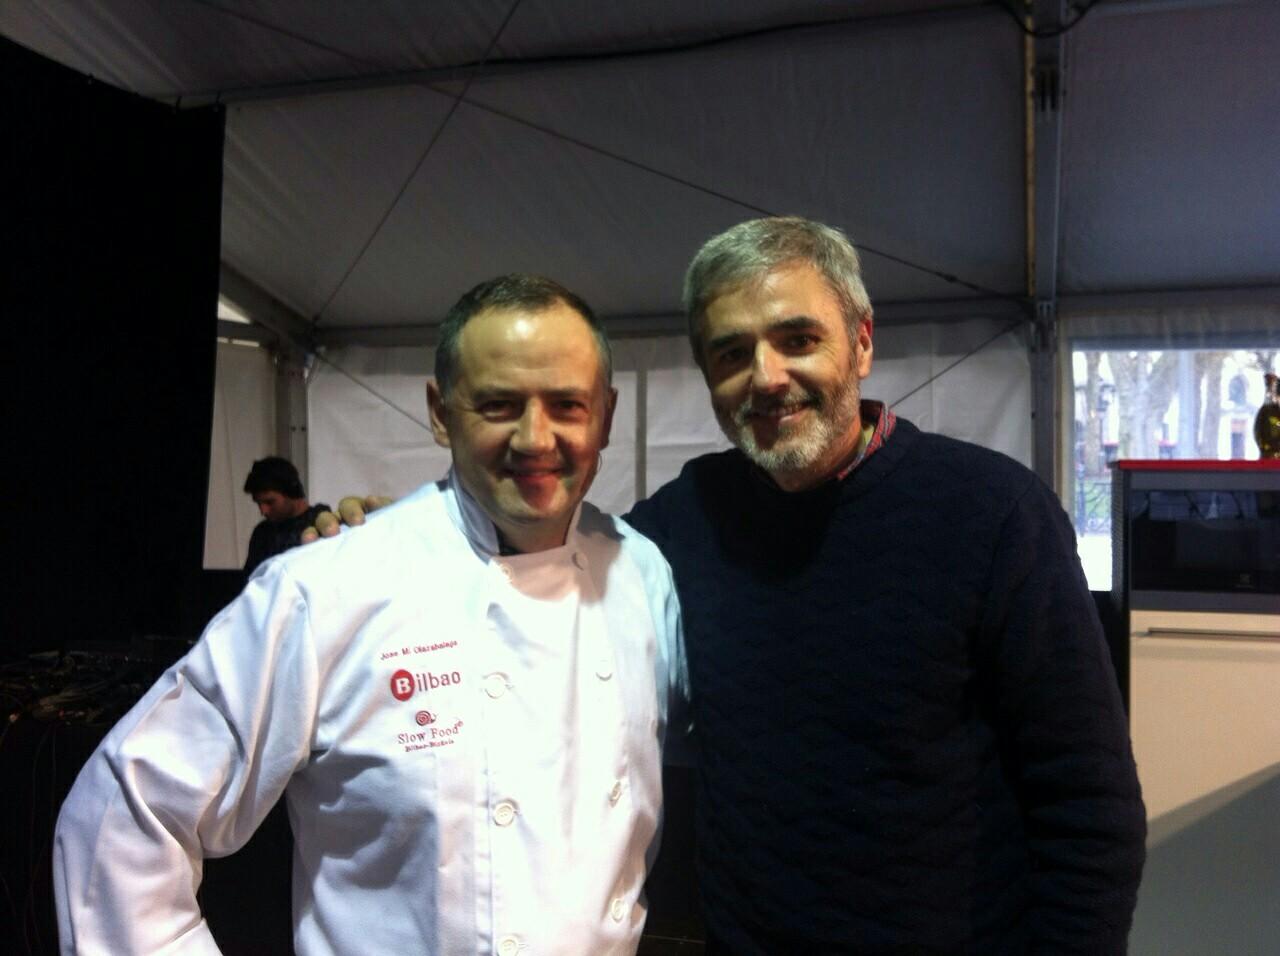 Jose Miguel Olazabalaga y Mikel López Iturriaga